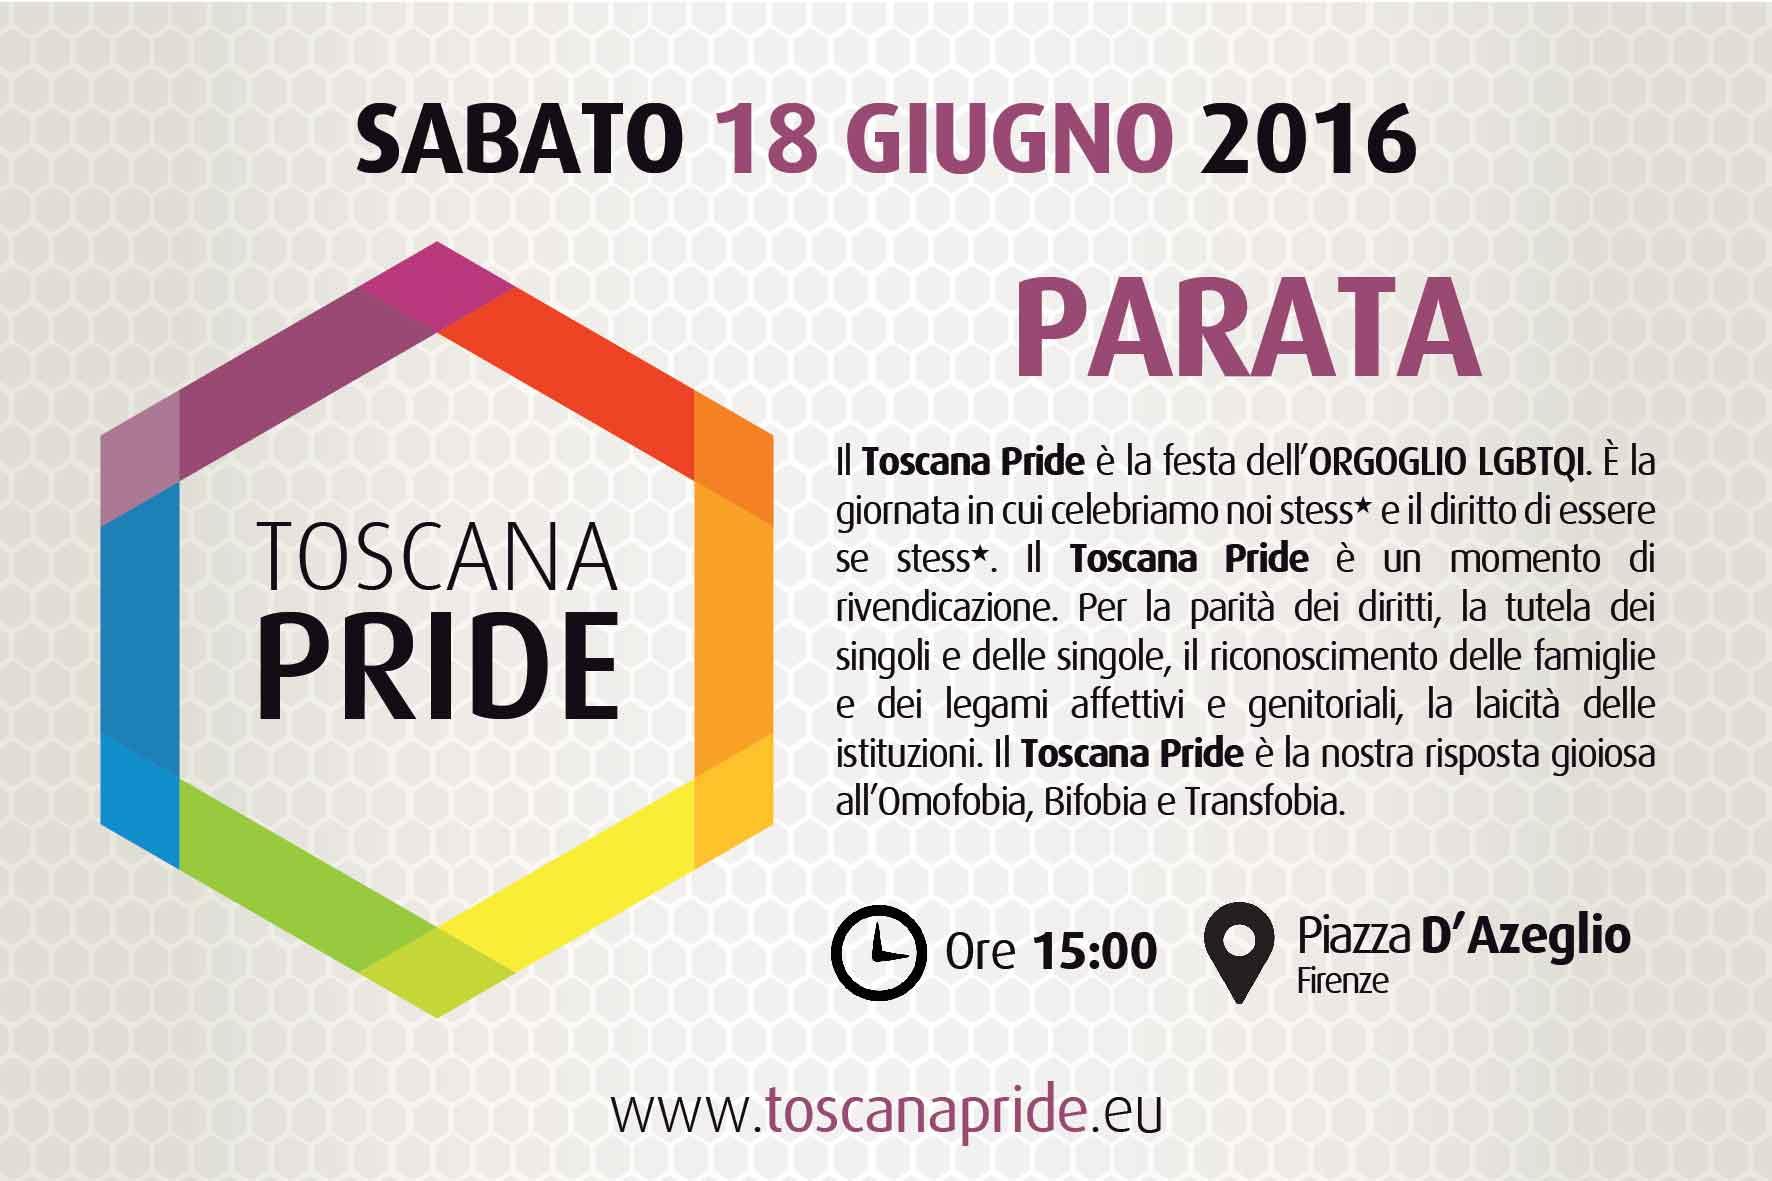 toscana-pride-firenze-pride-18-giugno-2016